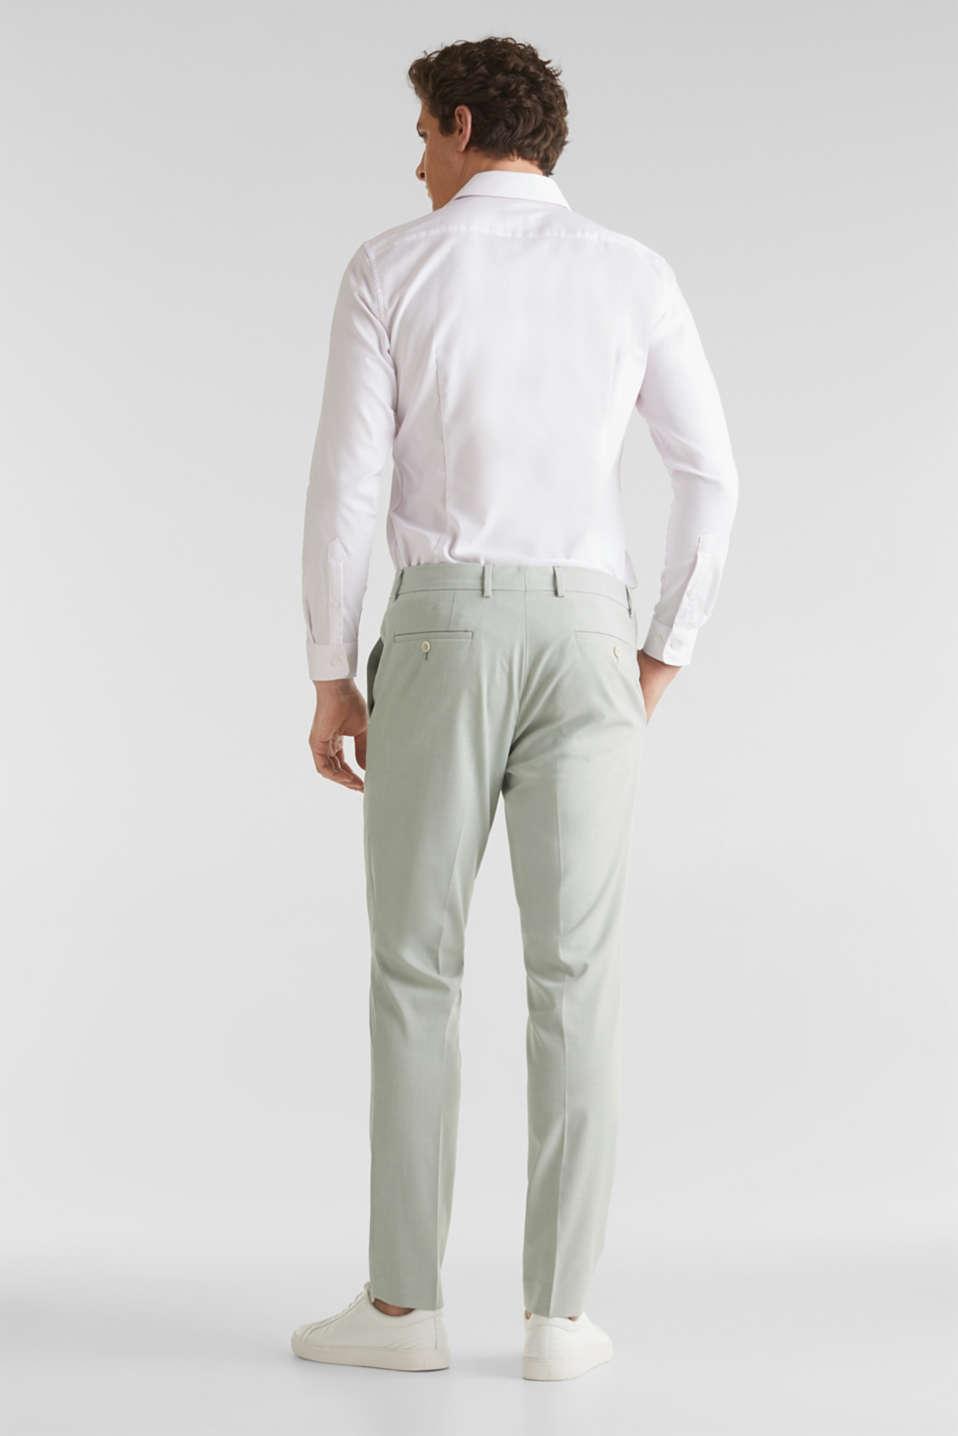 FINE MELANGE mix + match trousers, PASTEL GREEN 5, detail image number 1